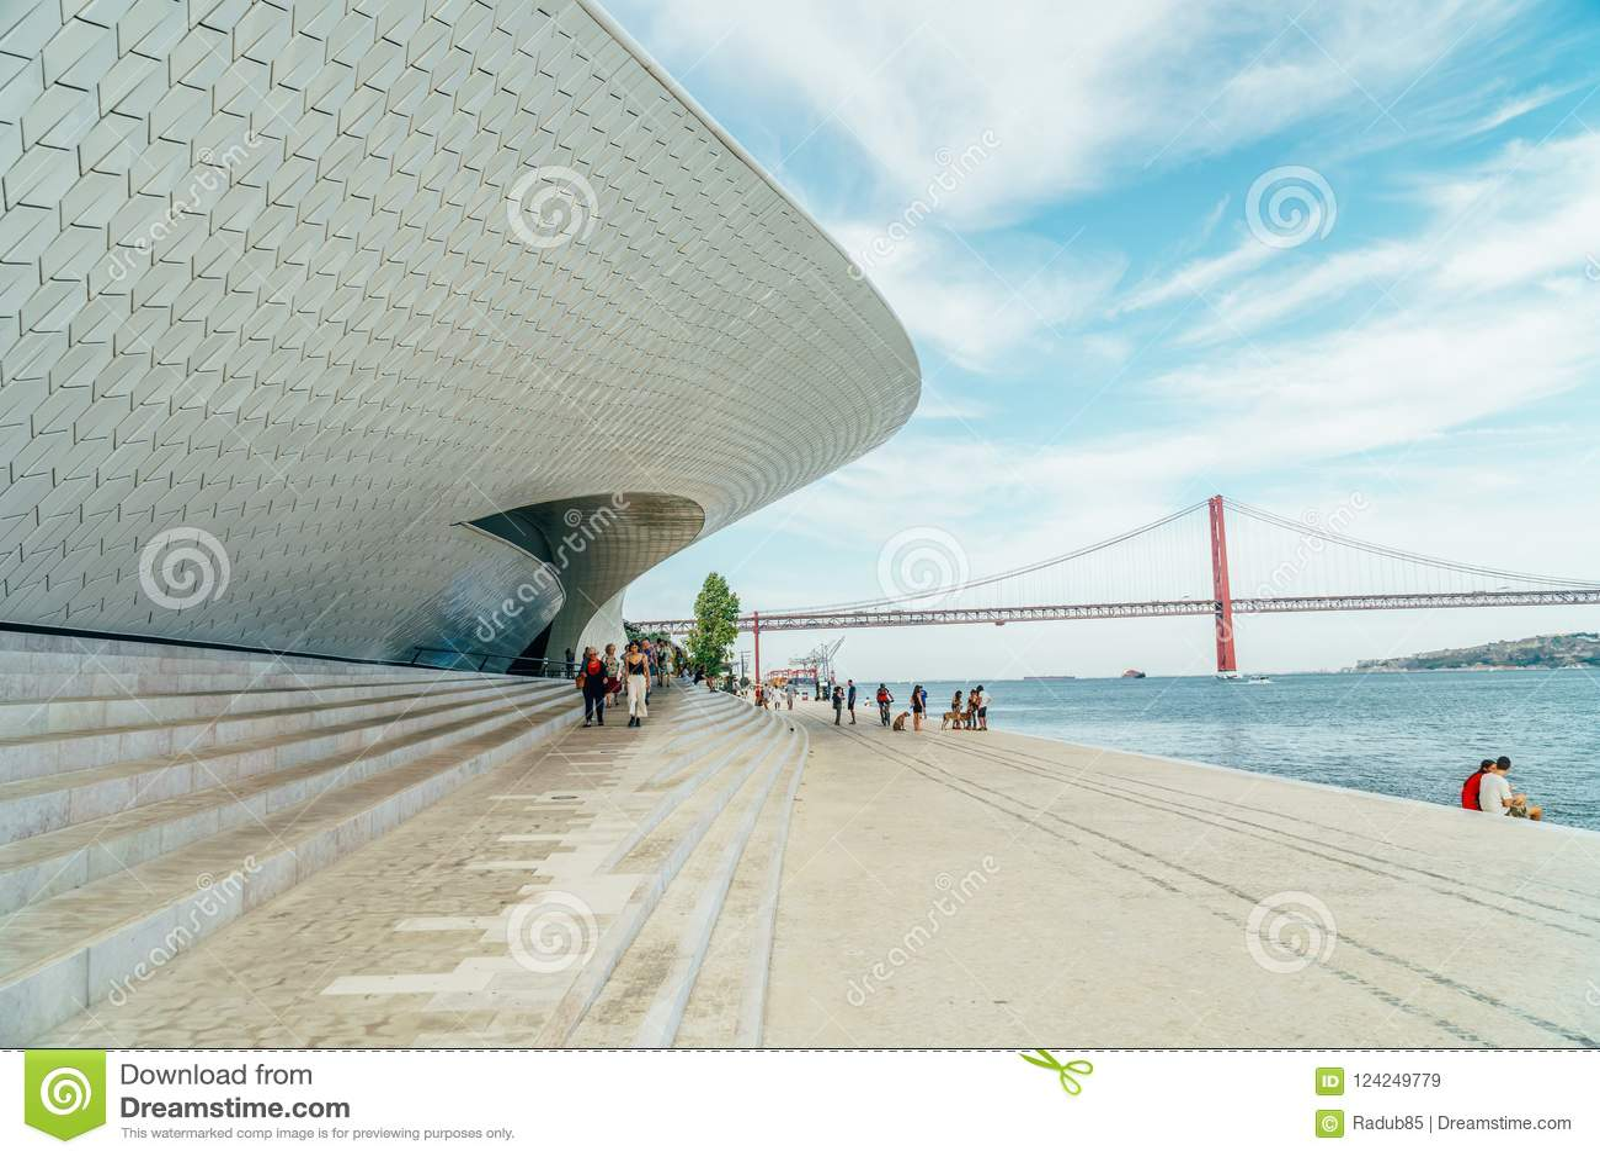 Das neue Kunstmuseum, die Architektur und Technology Museu de Arte, das Arquitetura e Tecnologia oder das MAAT